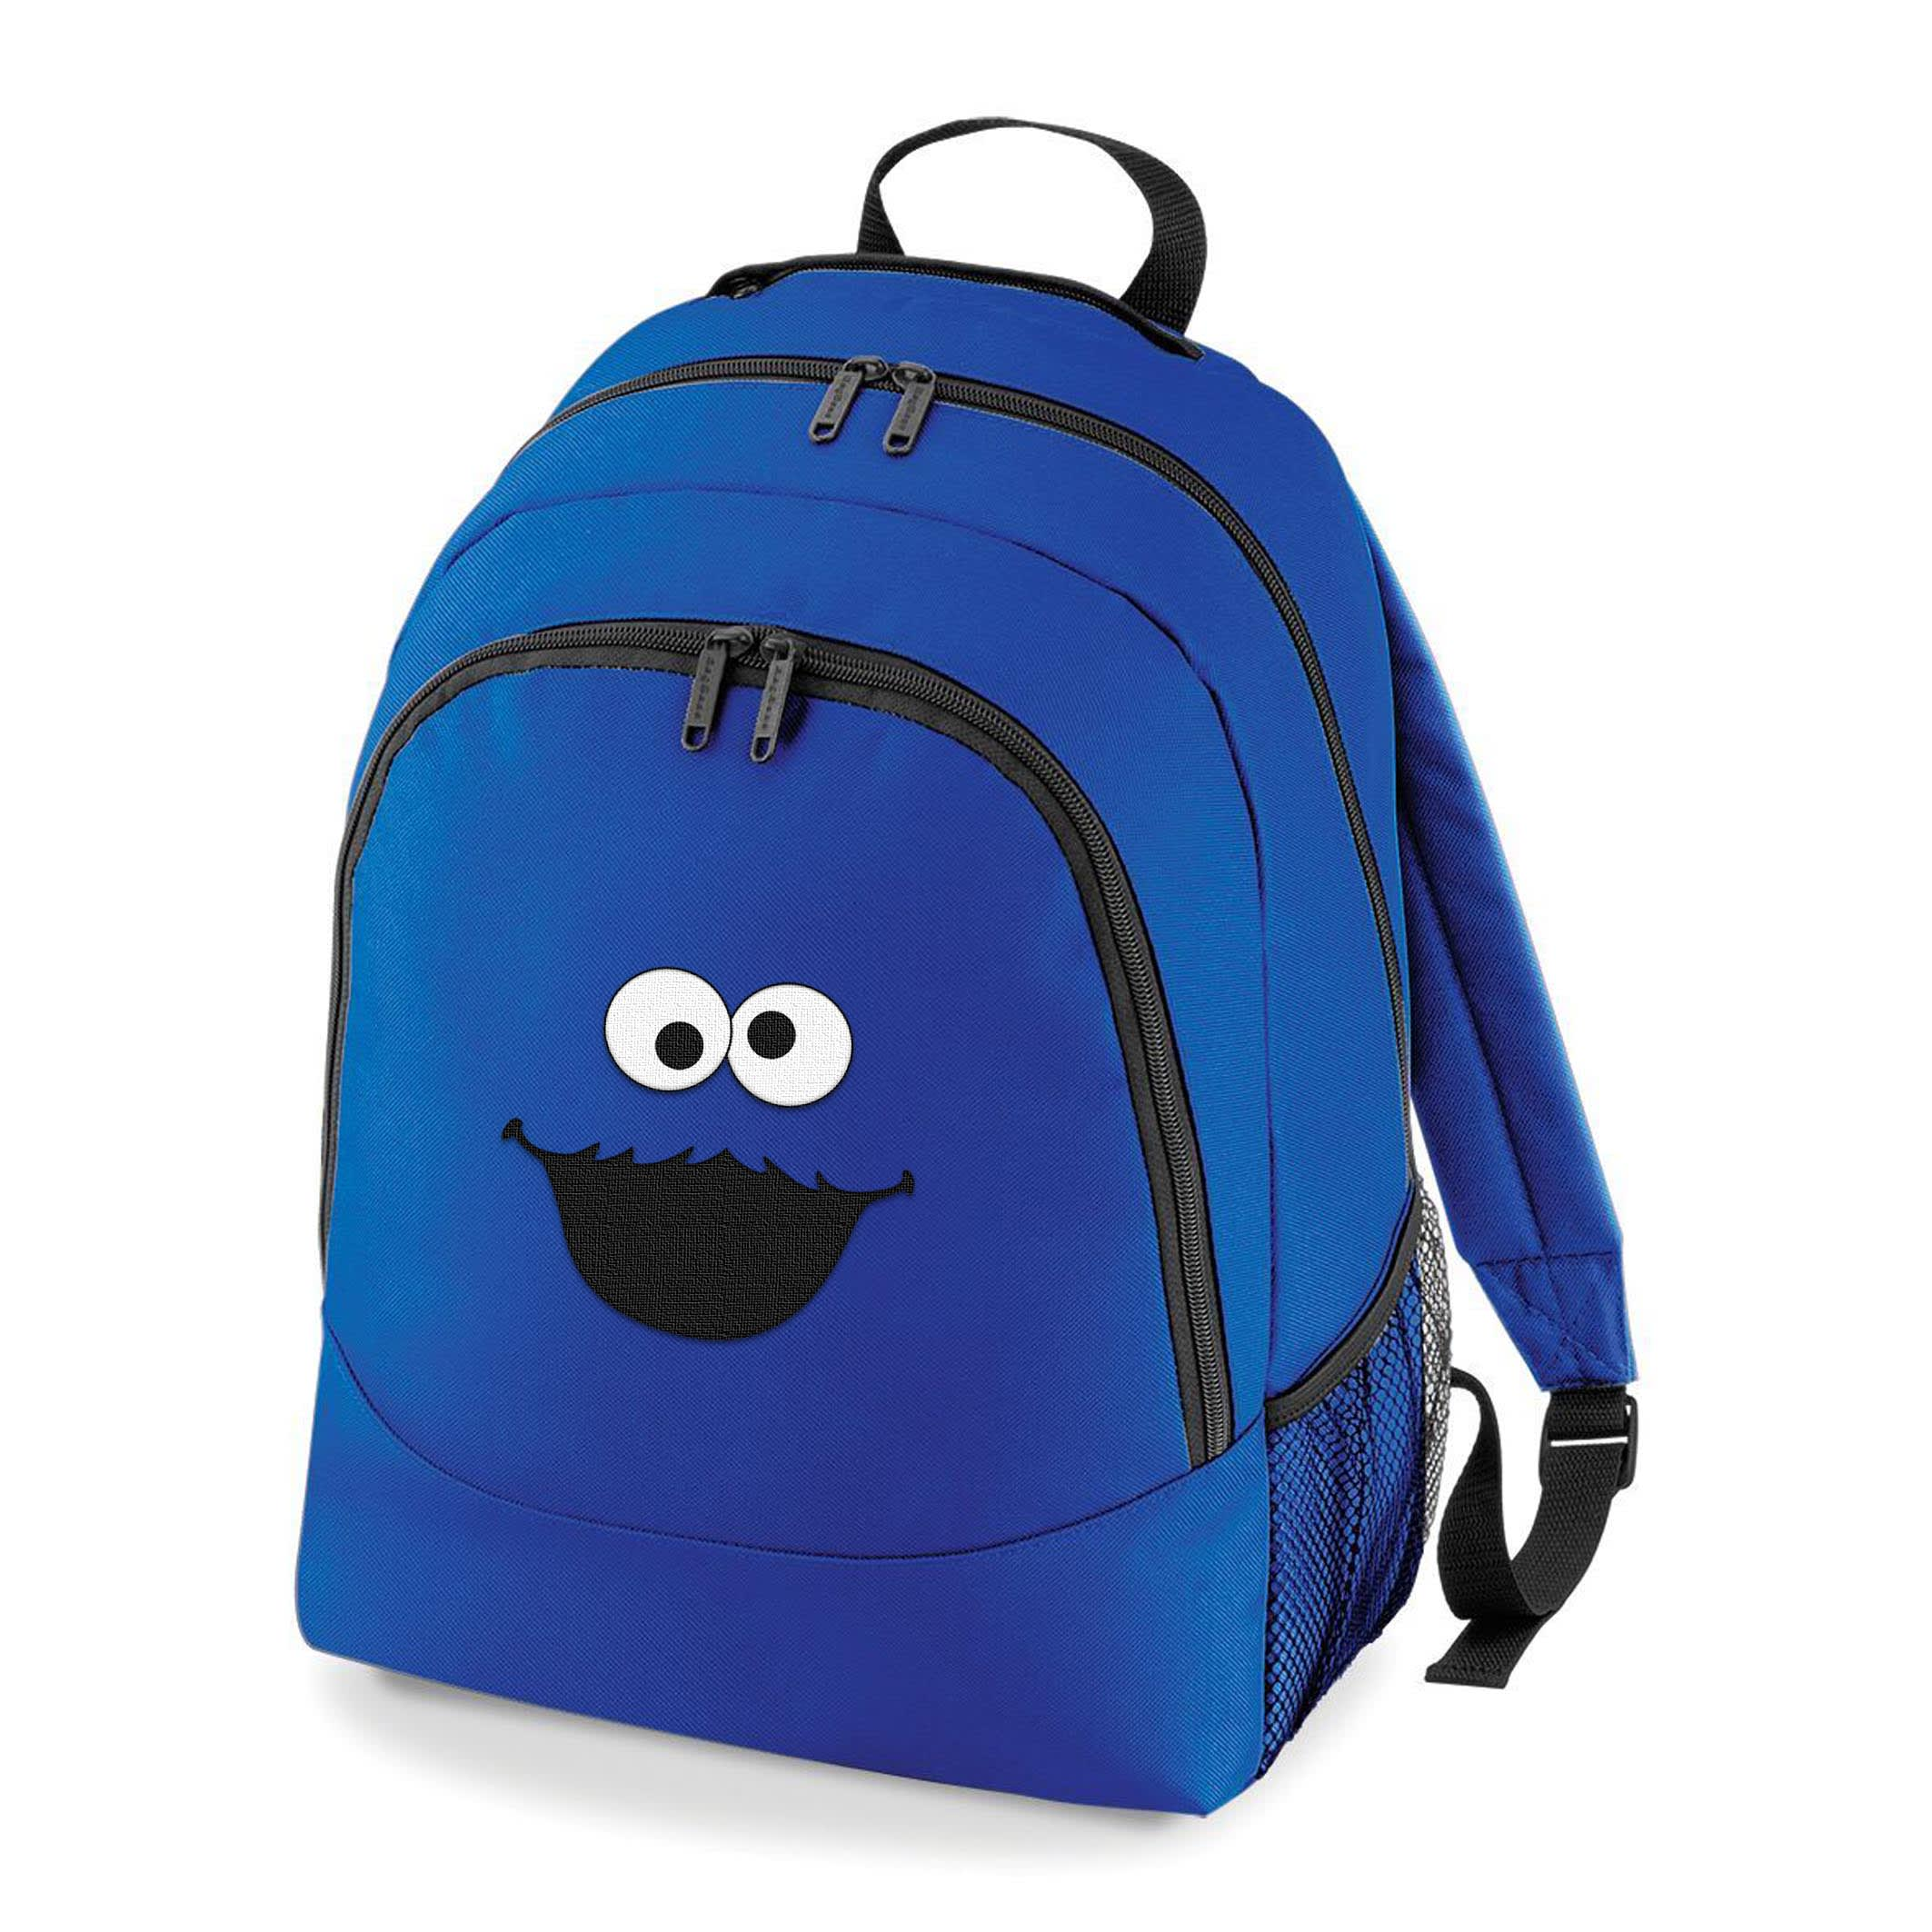 Cookie Monster Rucksack bag